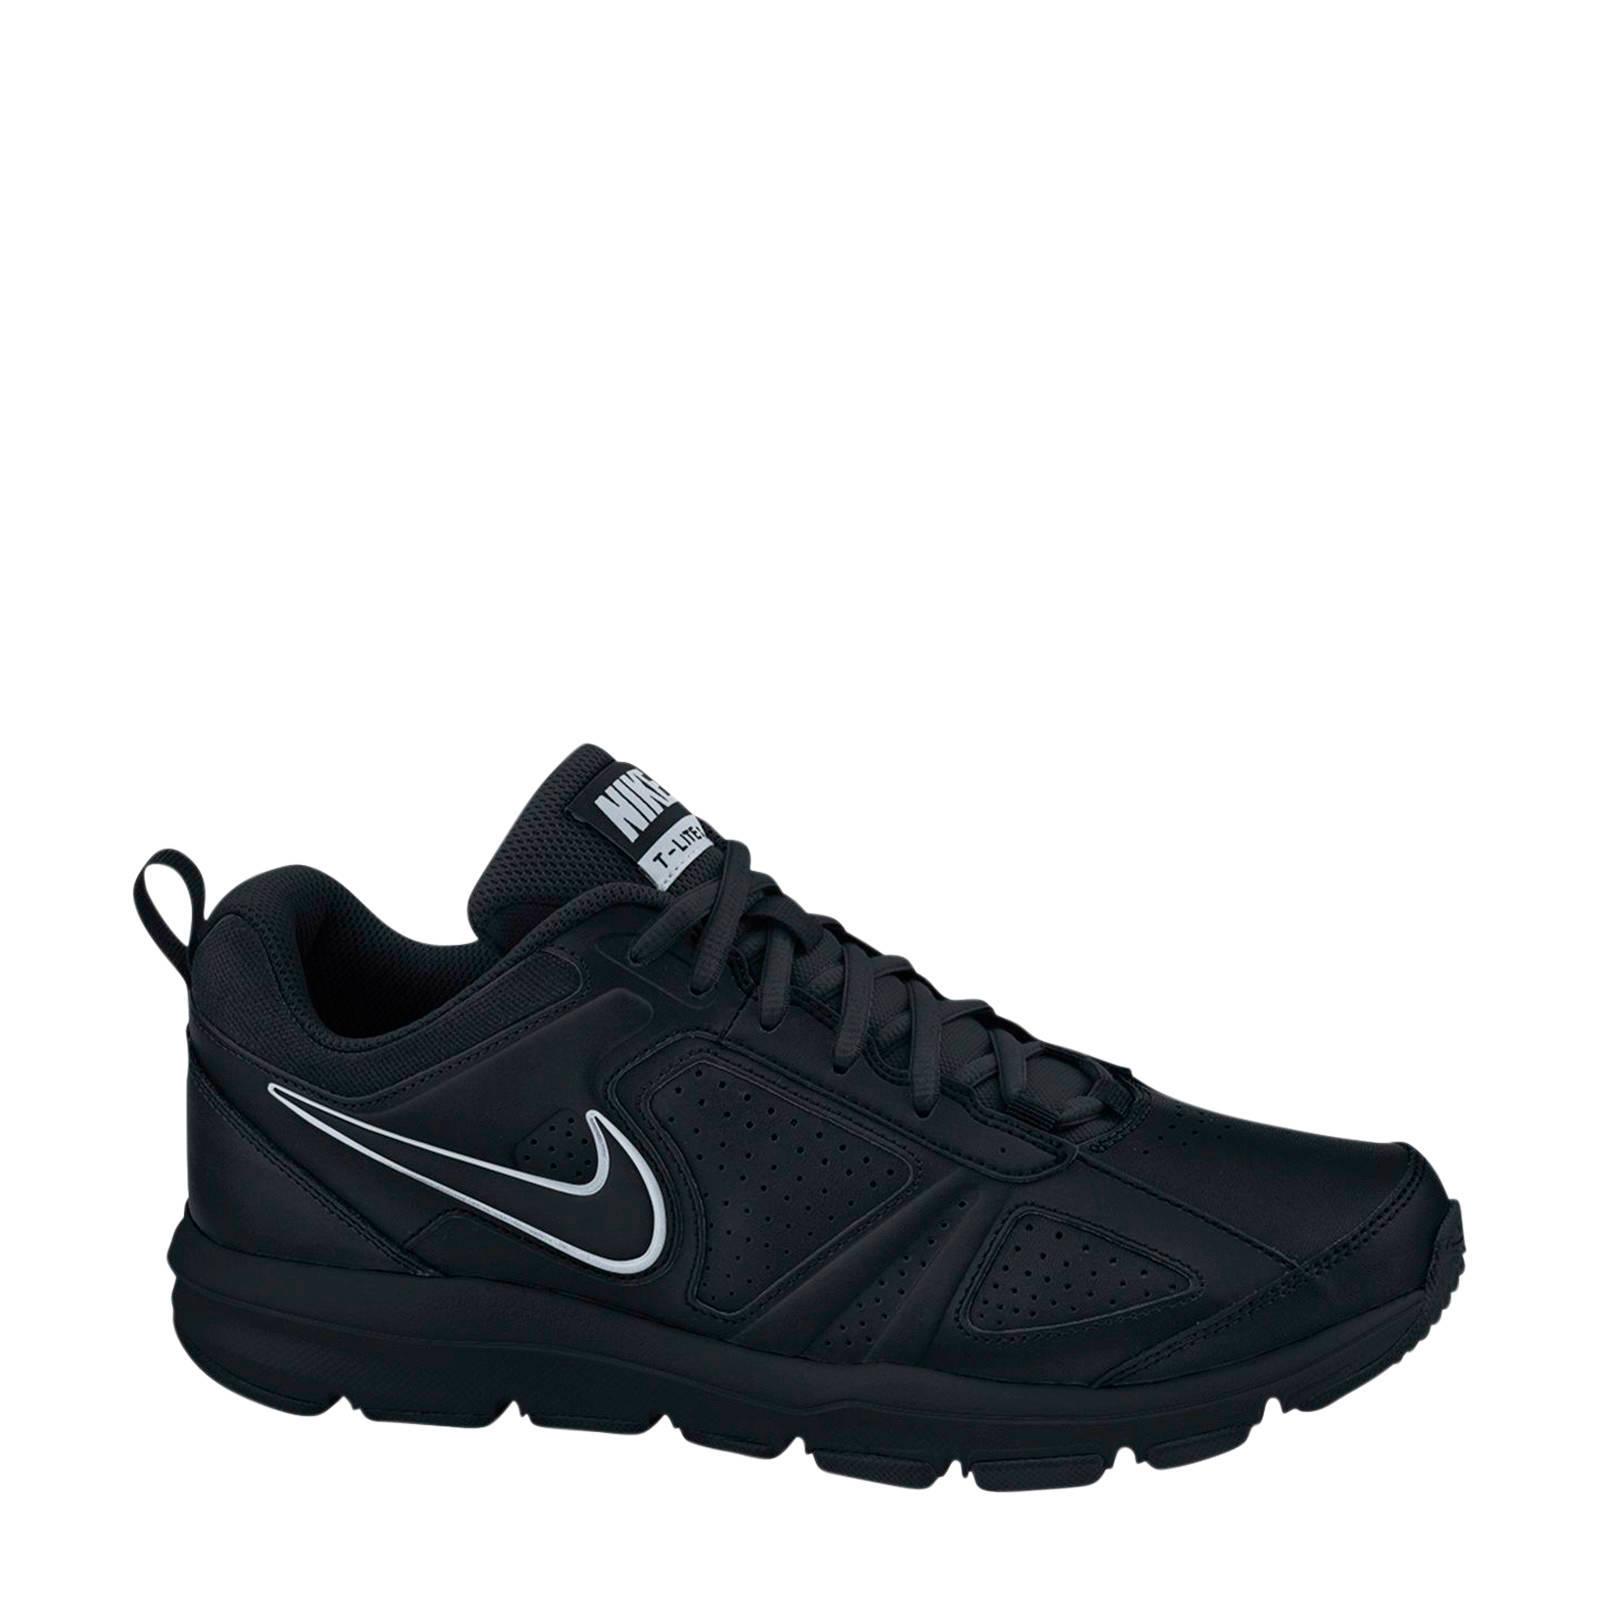 T Lite XI T Lite XI fitness schoenen zwart